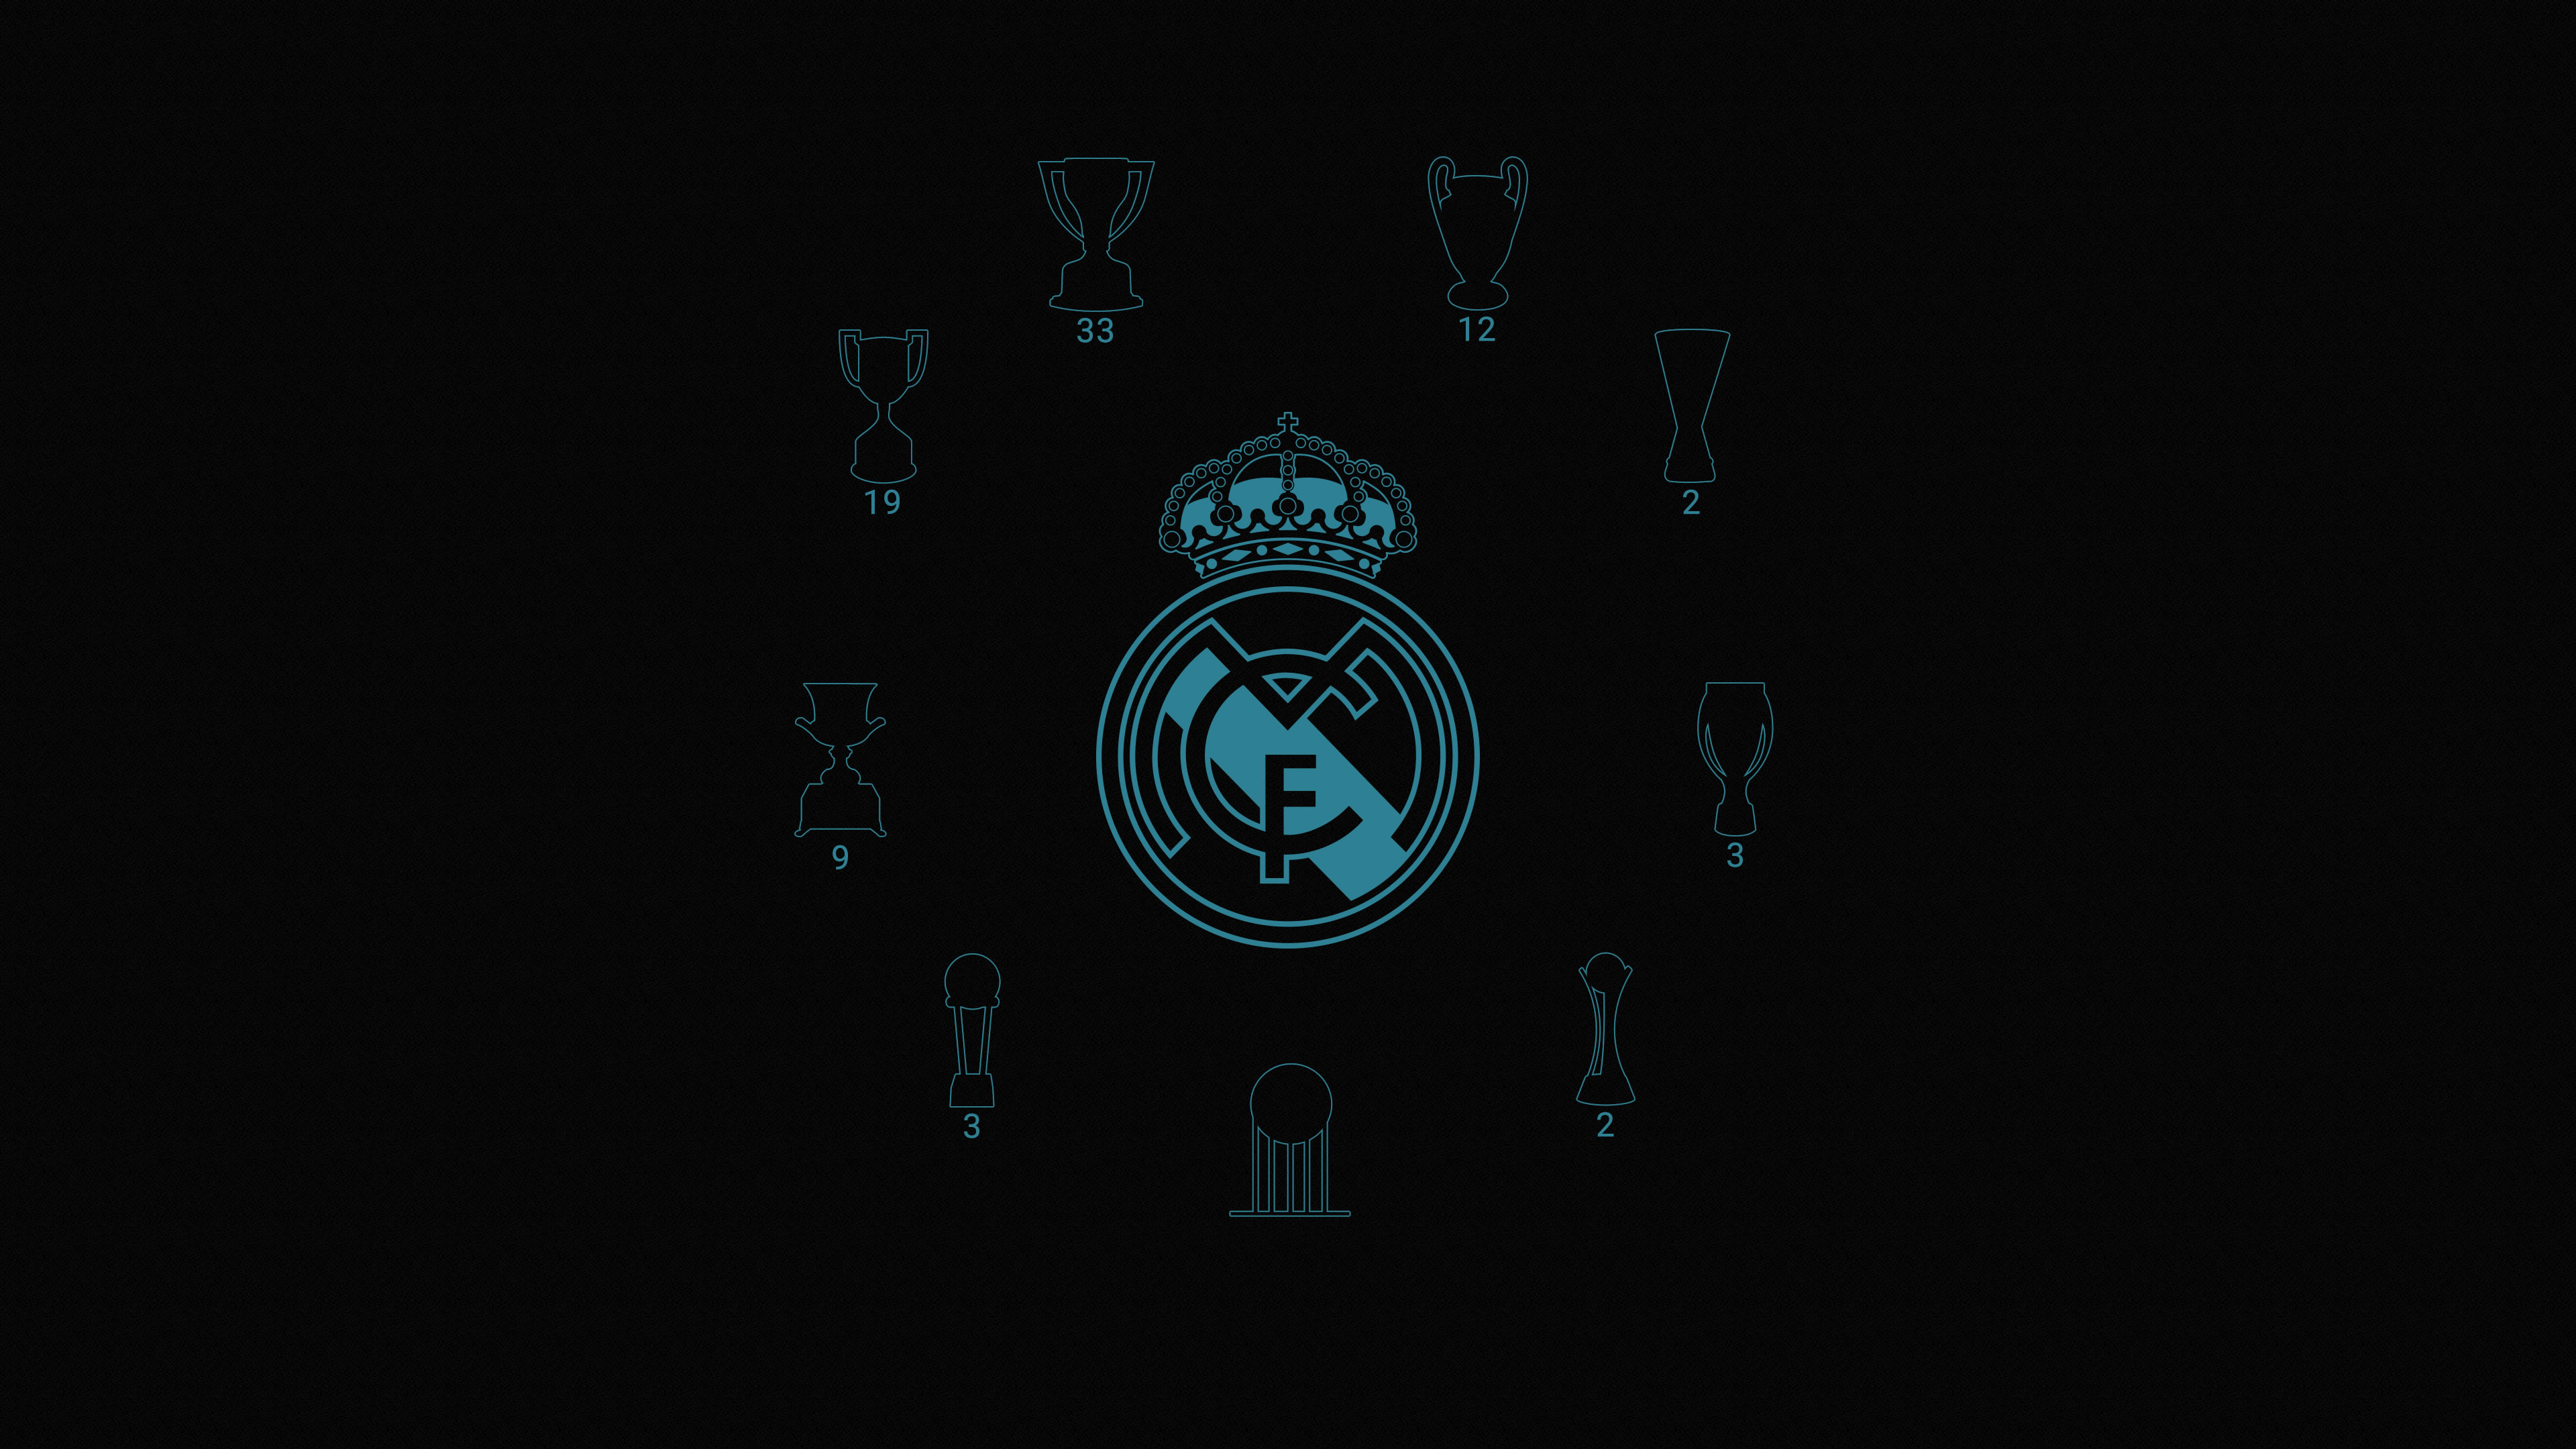 Real Madrid Away Wallpaper 201718 by khalidvawda on DeviantArt